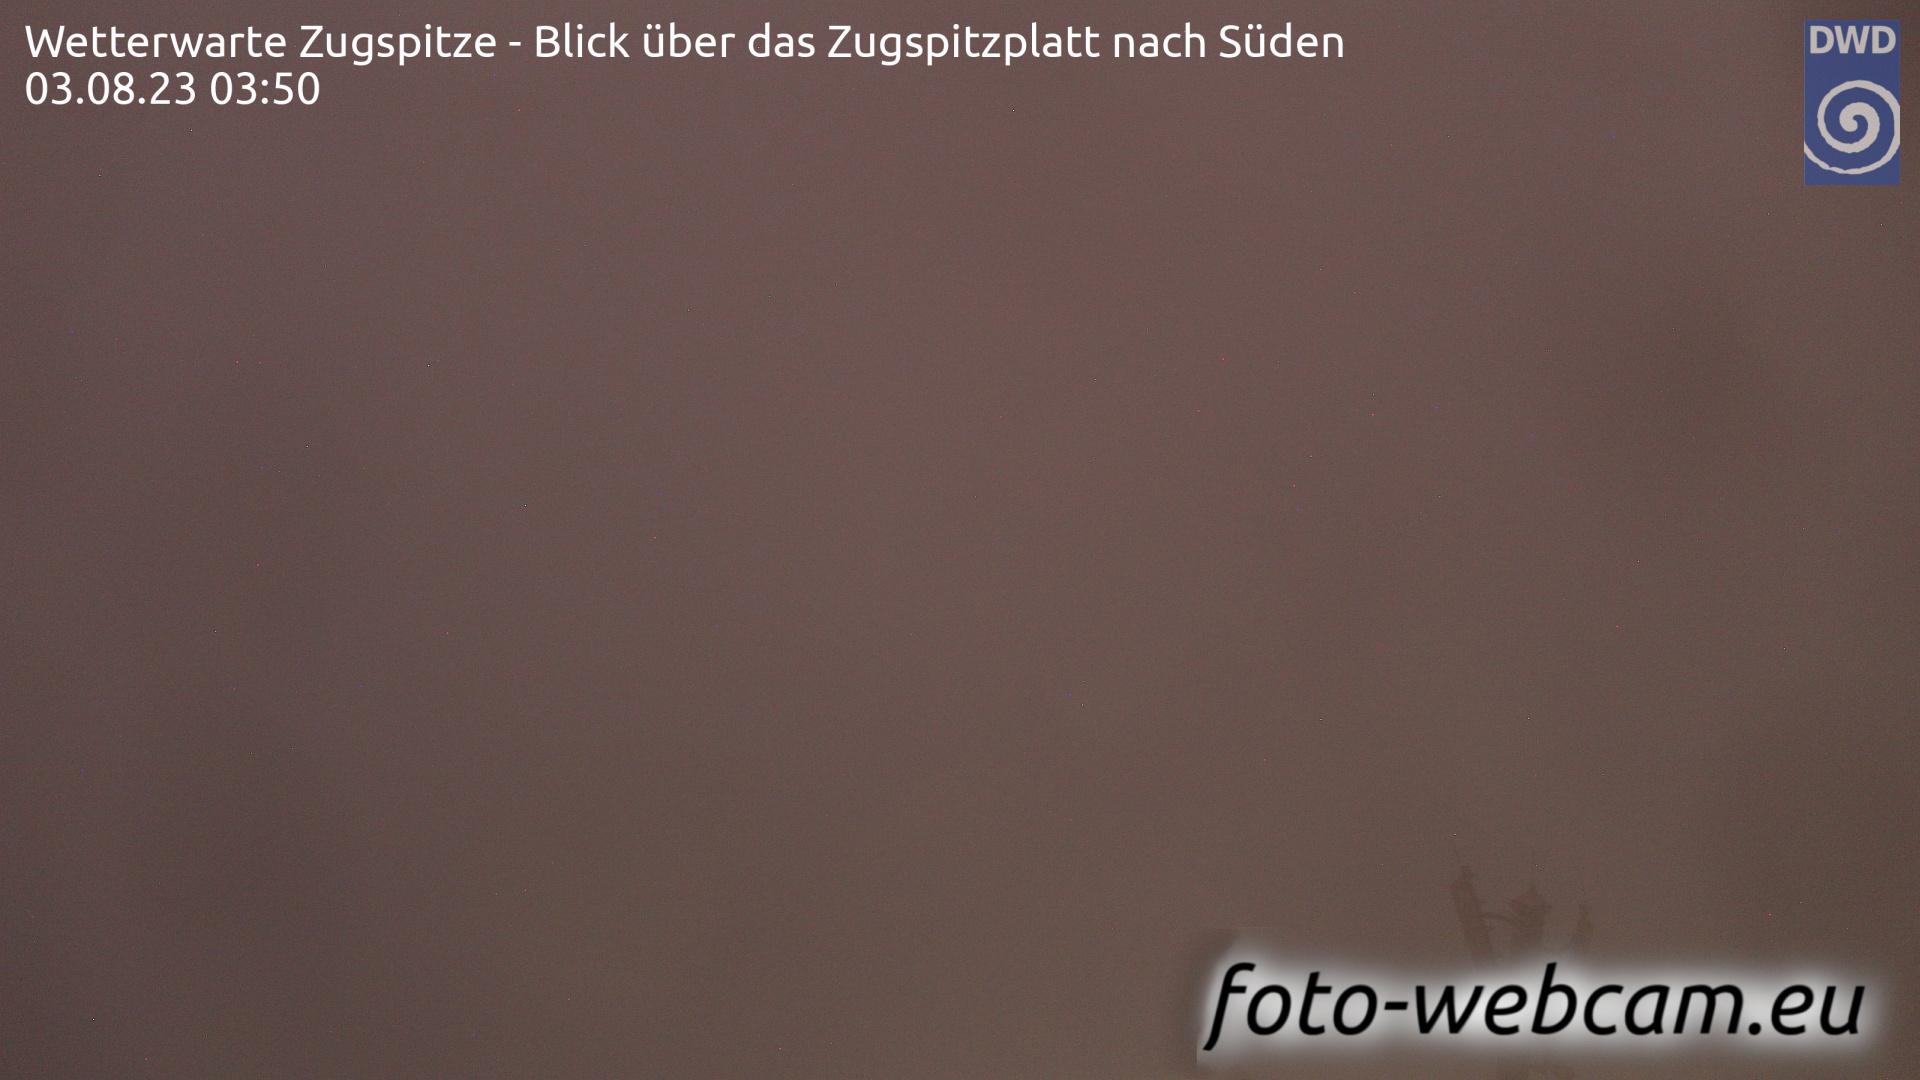 Zugspitze Fri. 03:58